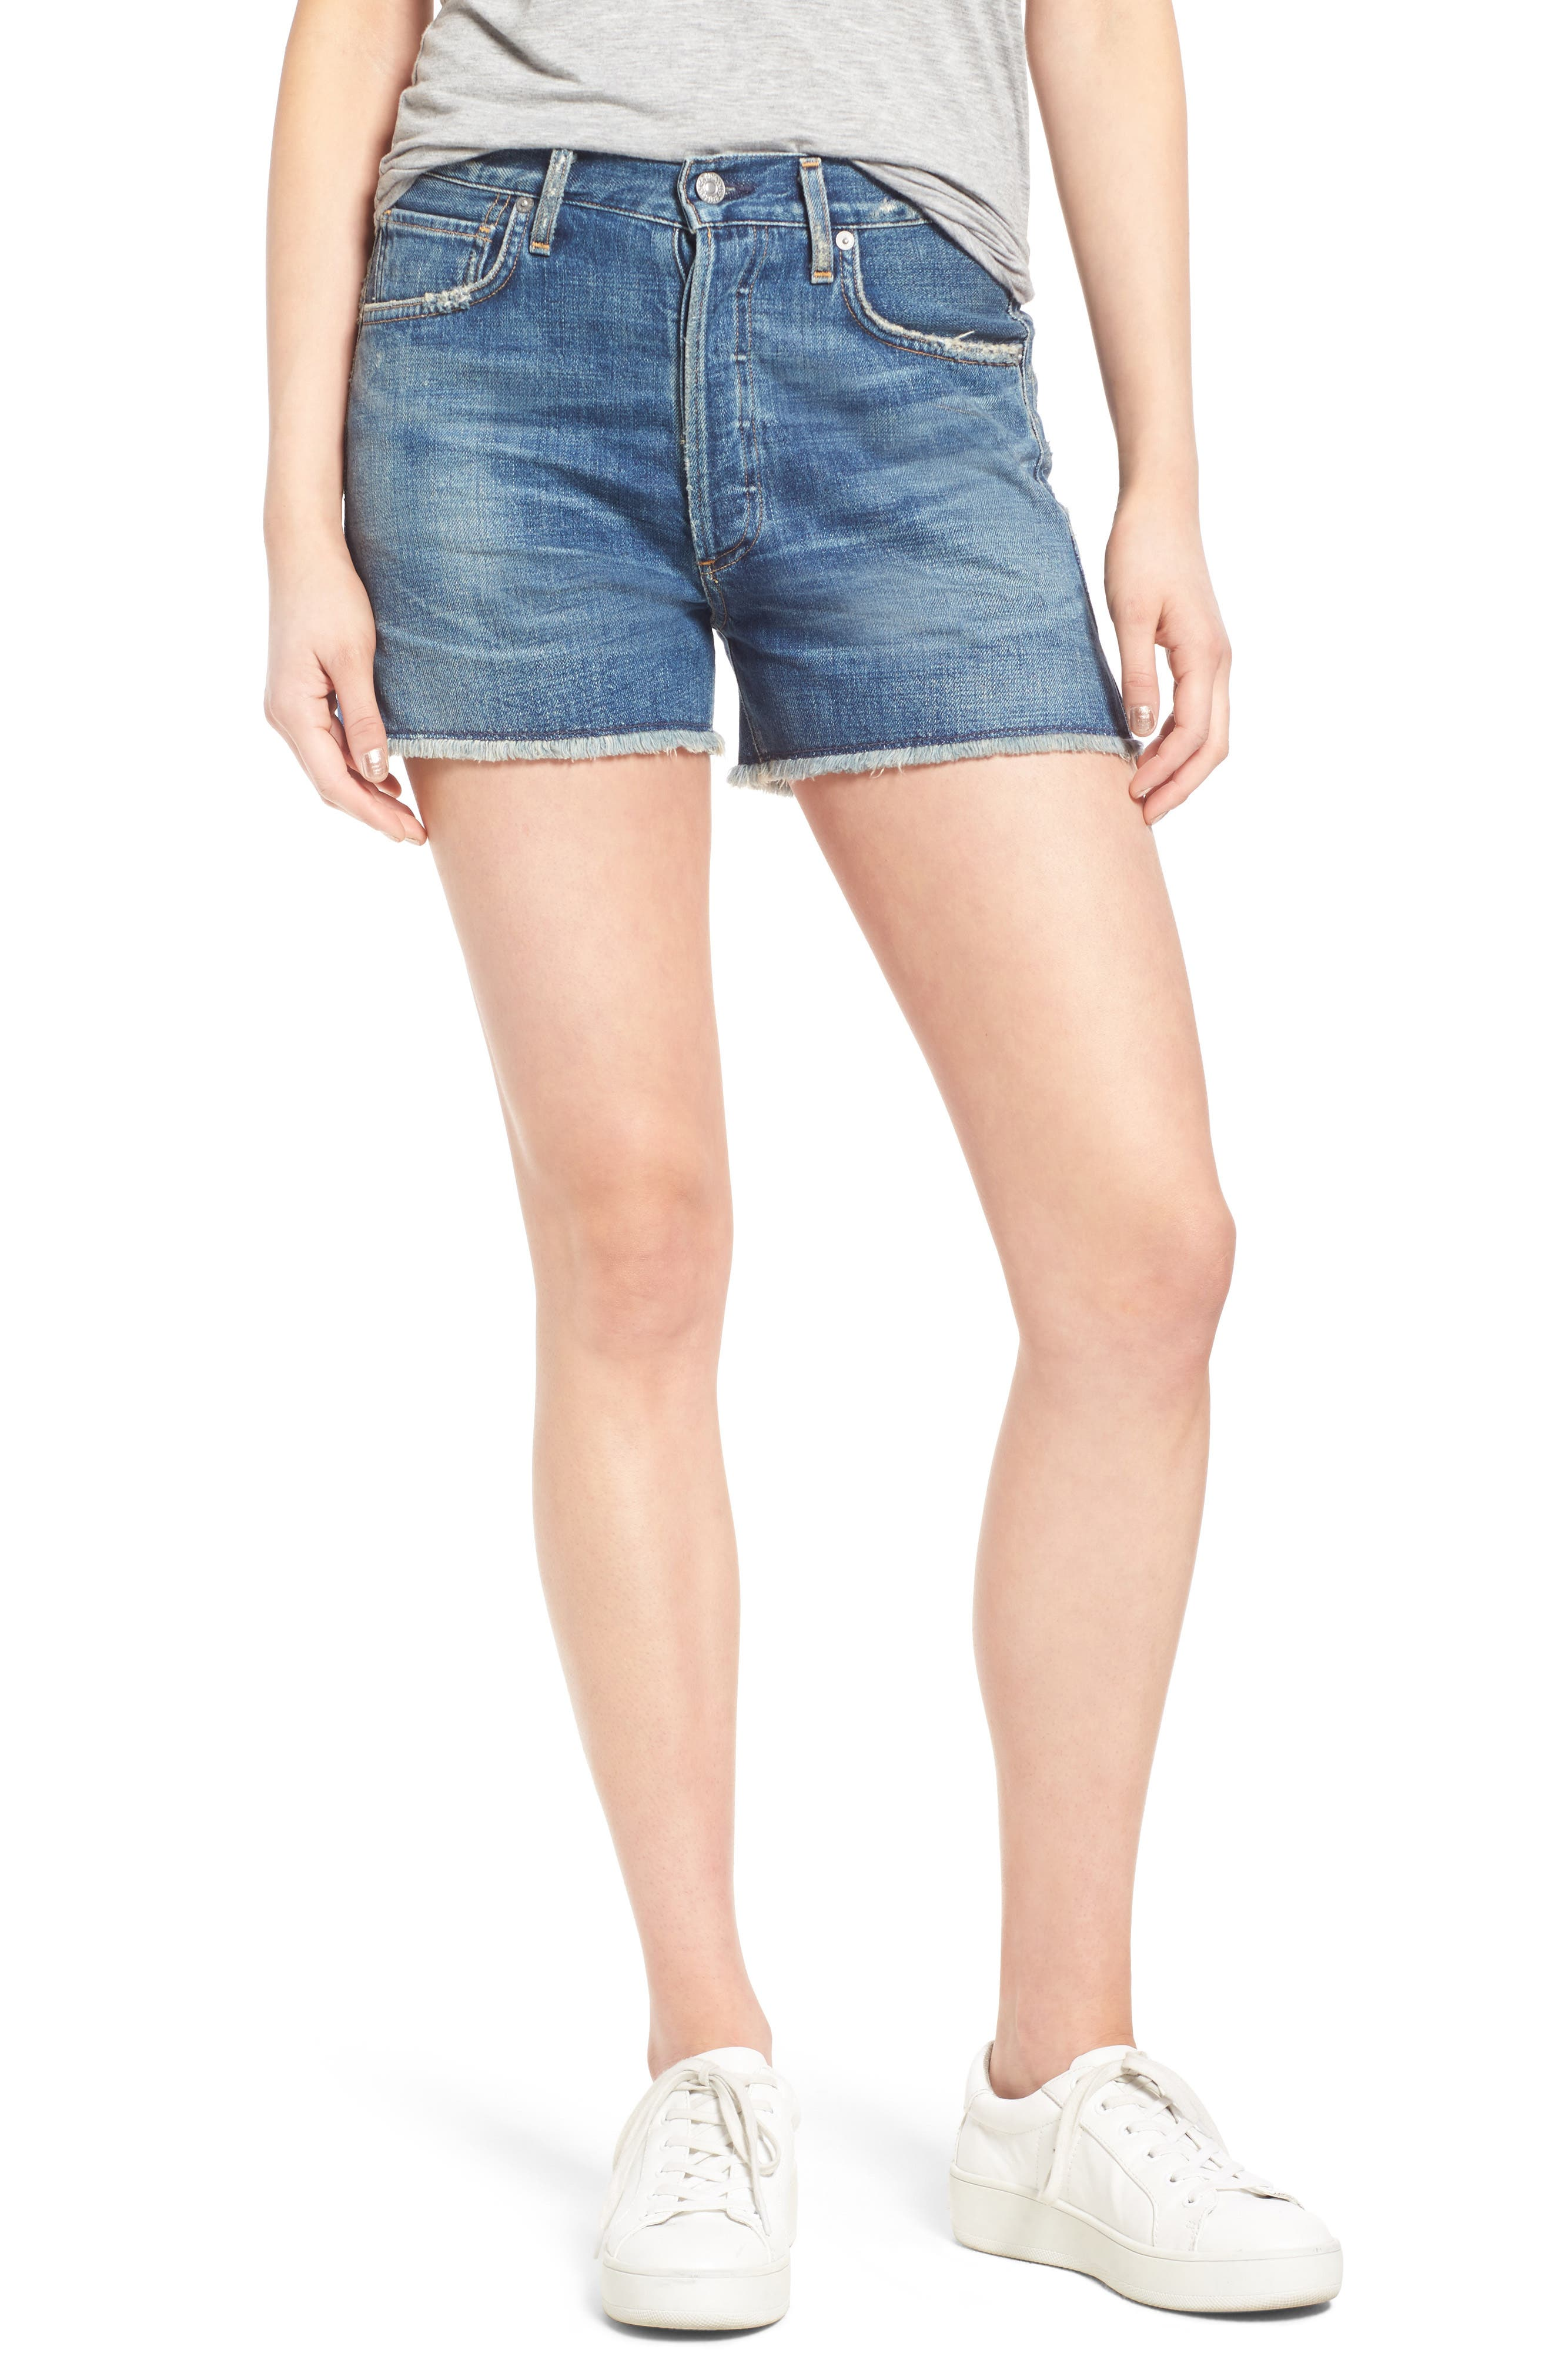 Alyx High Waist Cutoff Denim Shorts,                         Main,                         color, Teaser